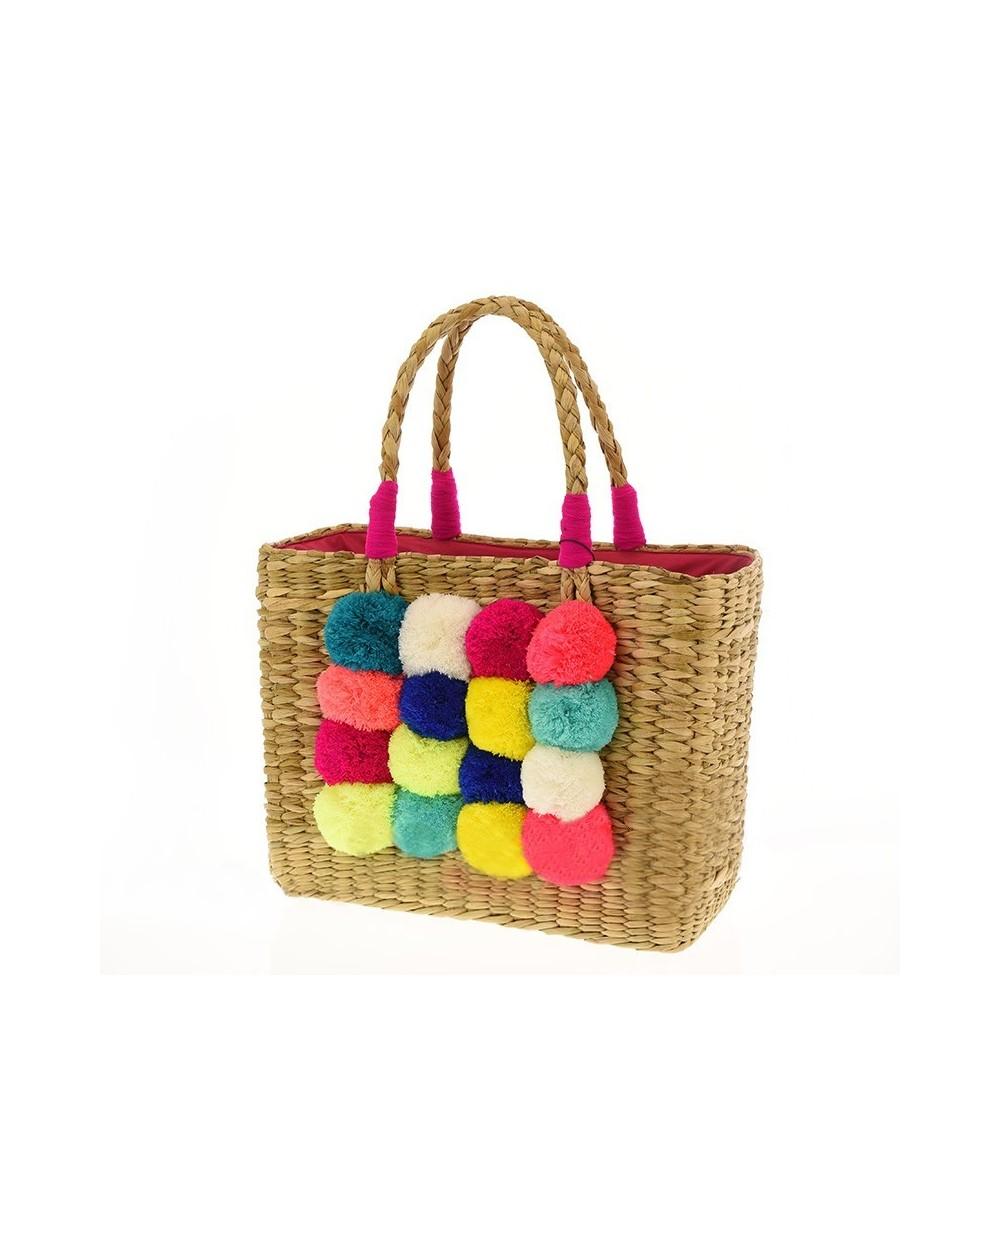 Torebka koszyk designerski z pomponami